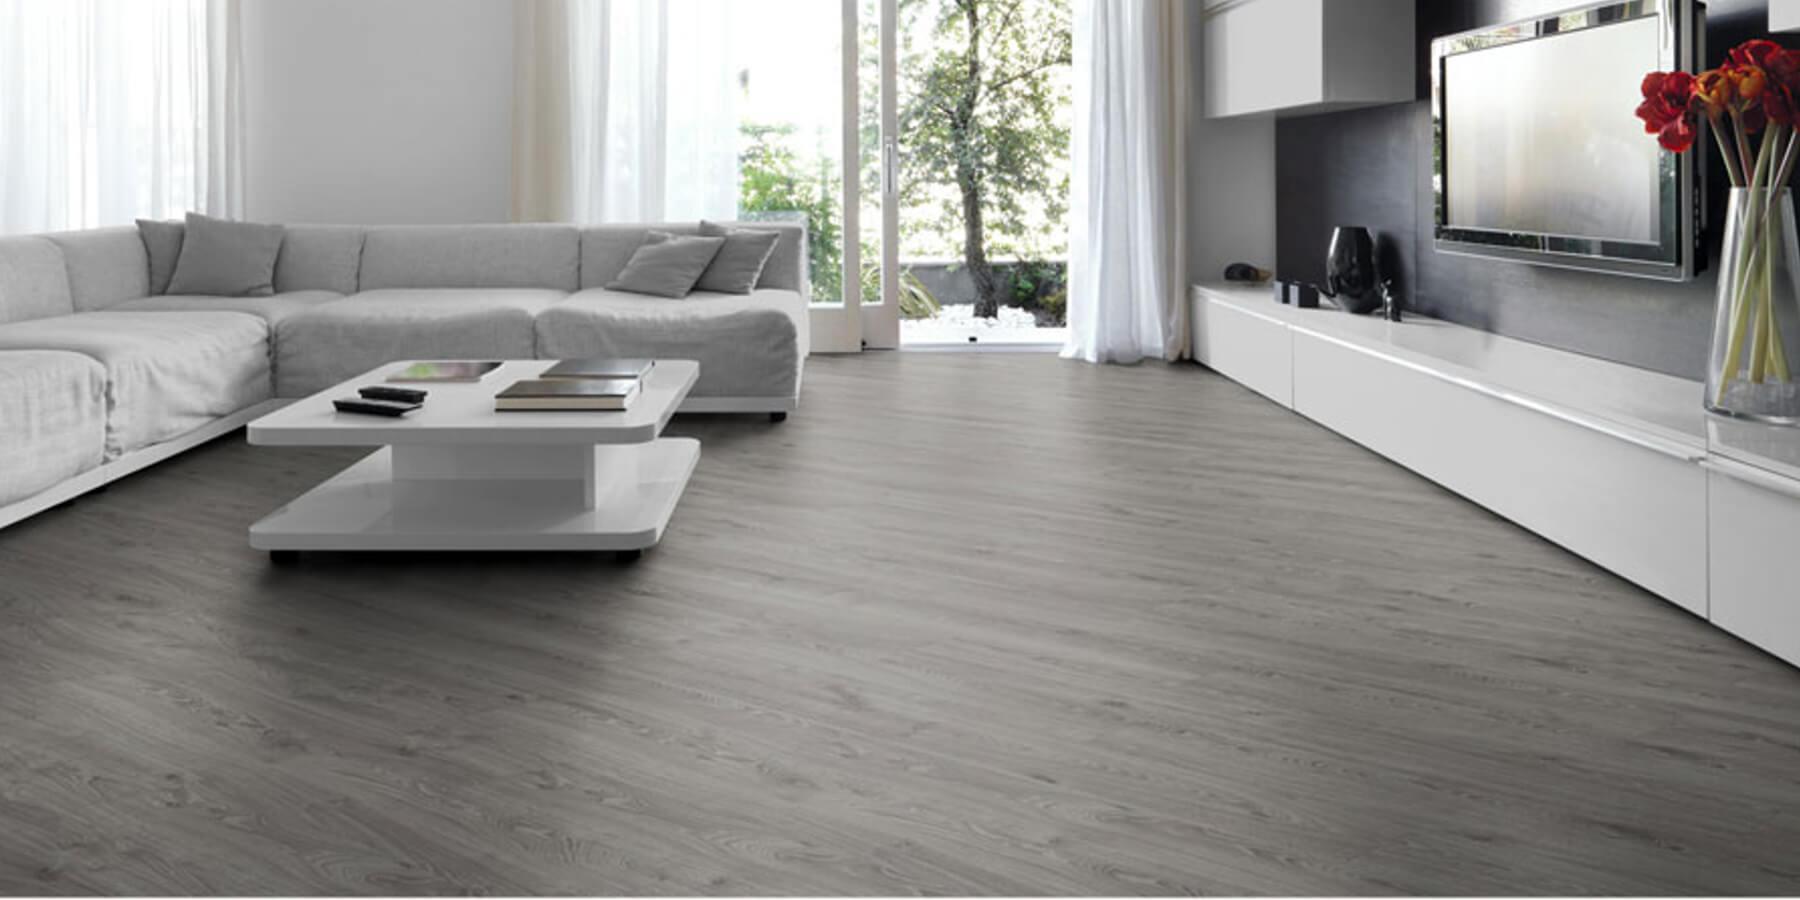 Why do most people choose vinyl flooring?